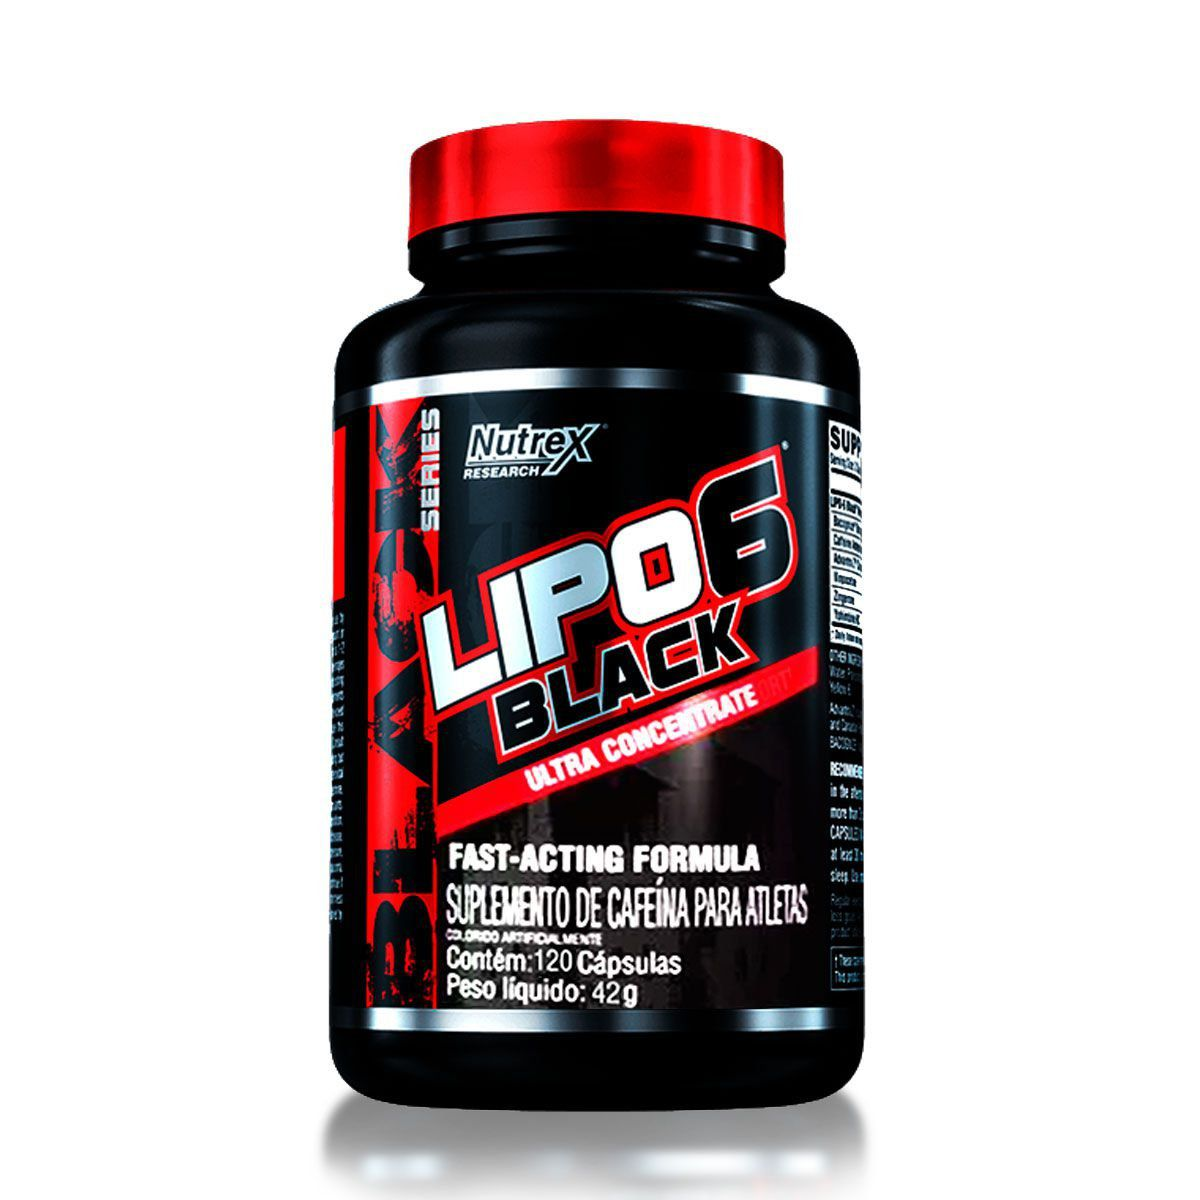 Lipo 6 Black 120 Capsulas - Nutrex